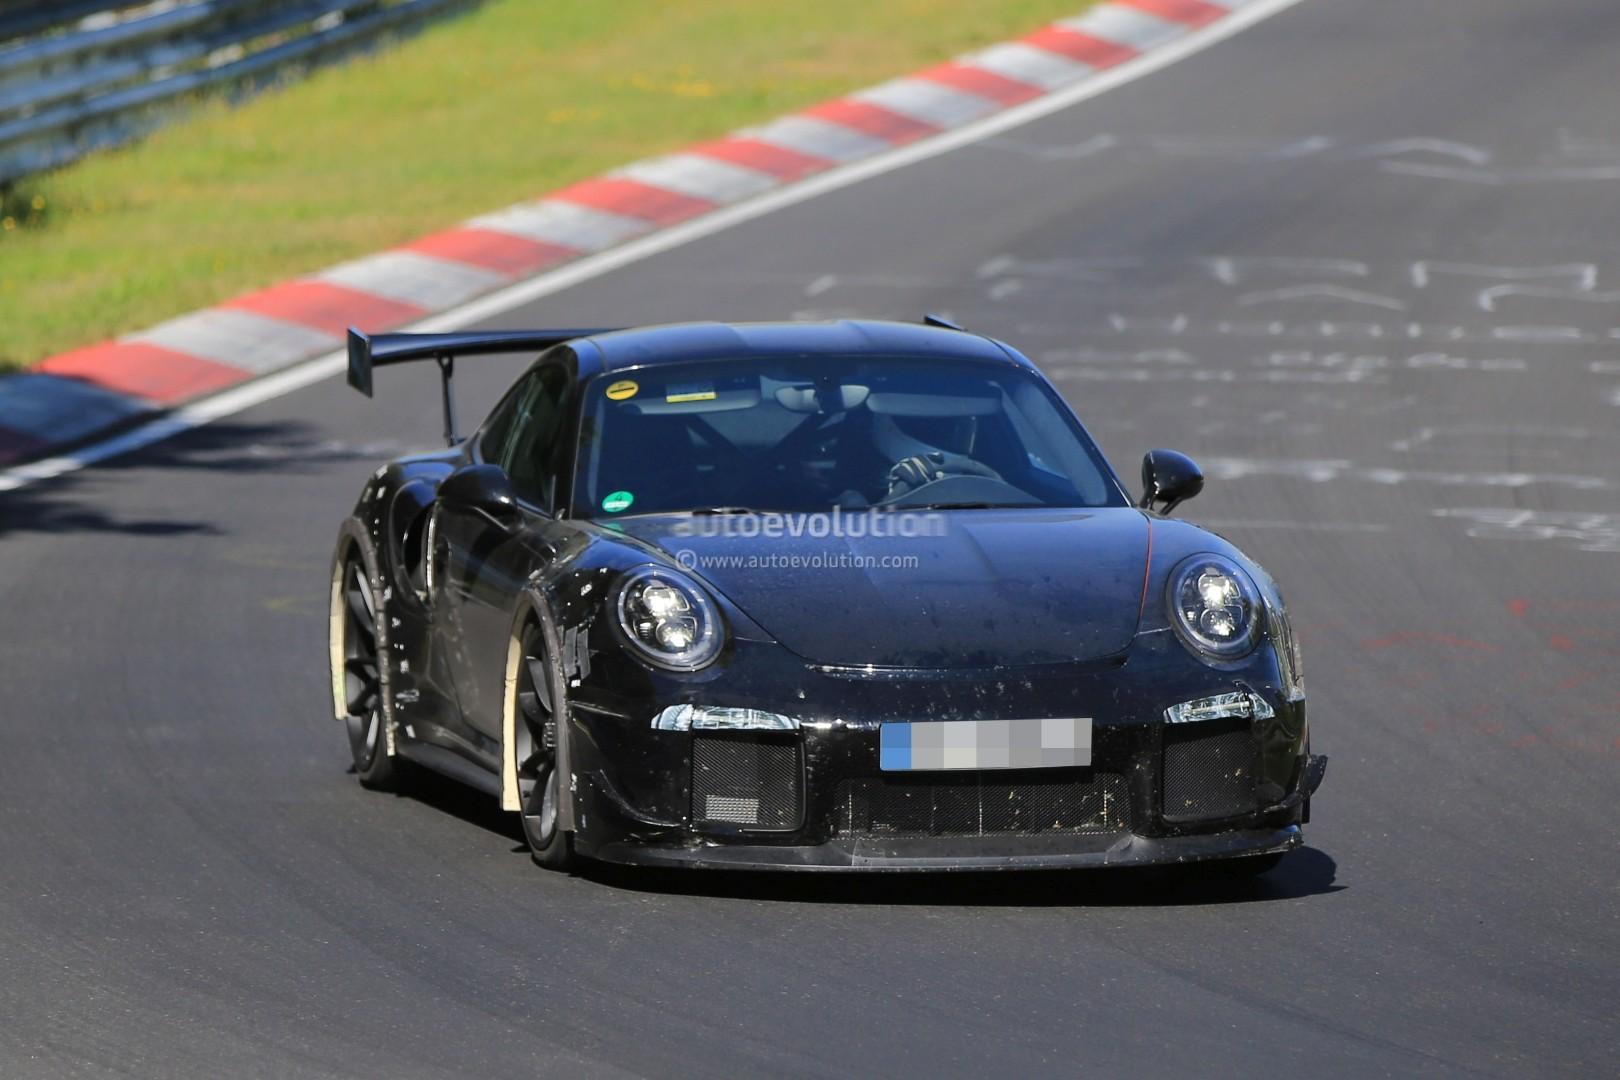 porsche 911 gt2 getting a flat tire at 207 mph on german autobahn sounds brut. Black Bedroom Furniture Sets. Home Design Ideas